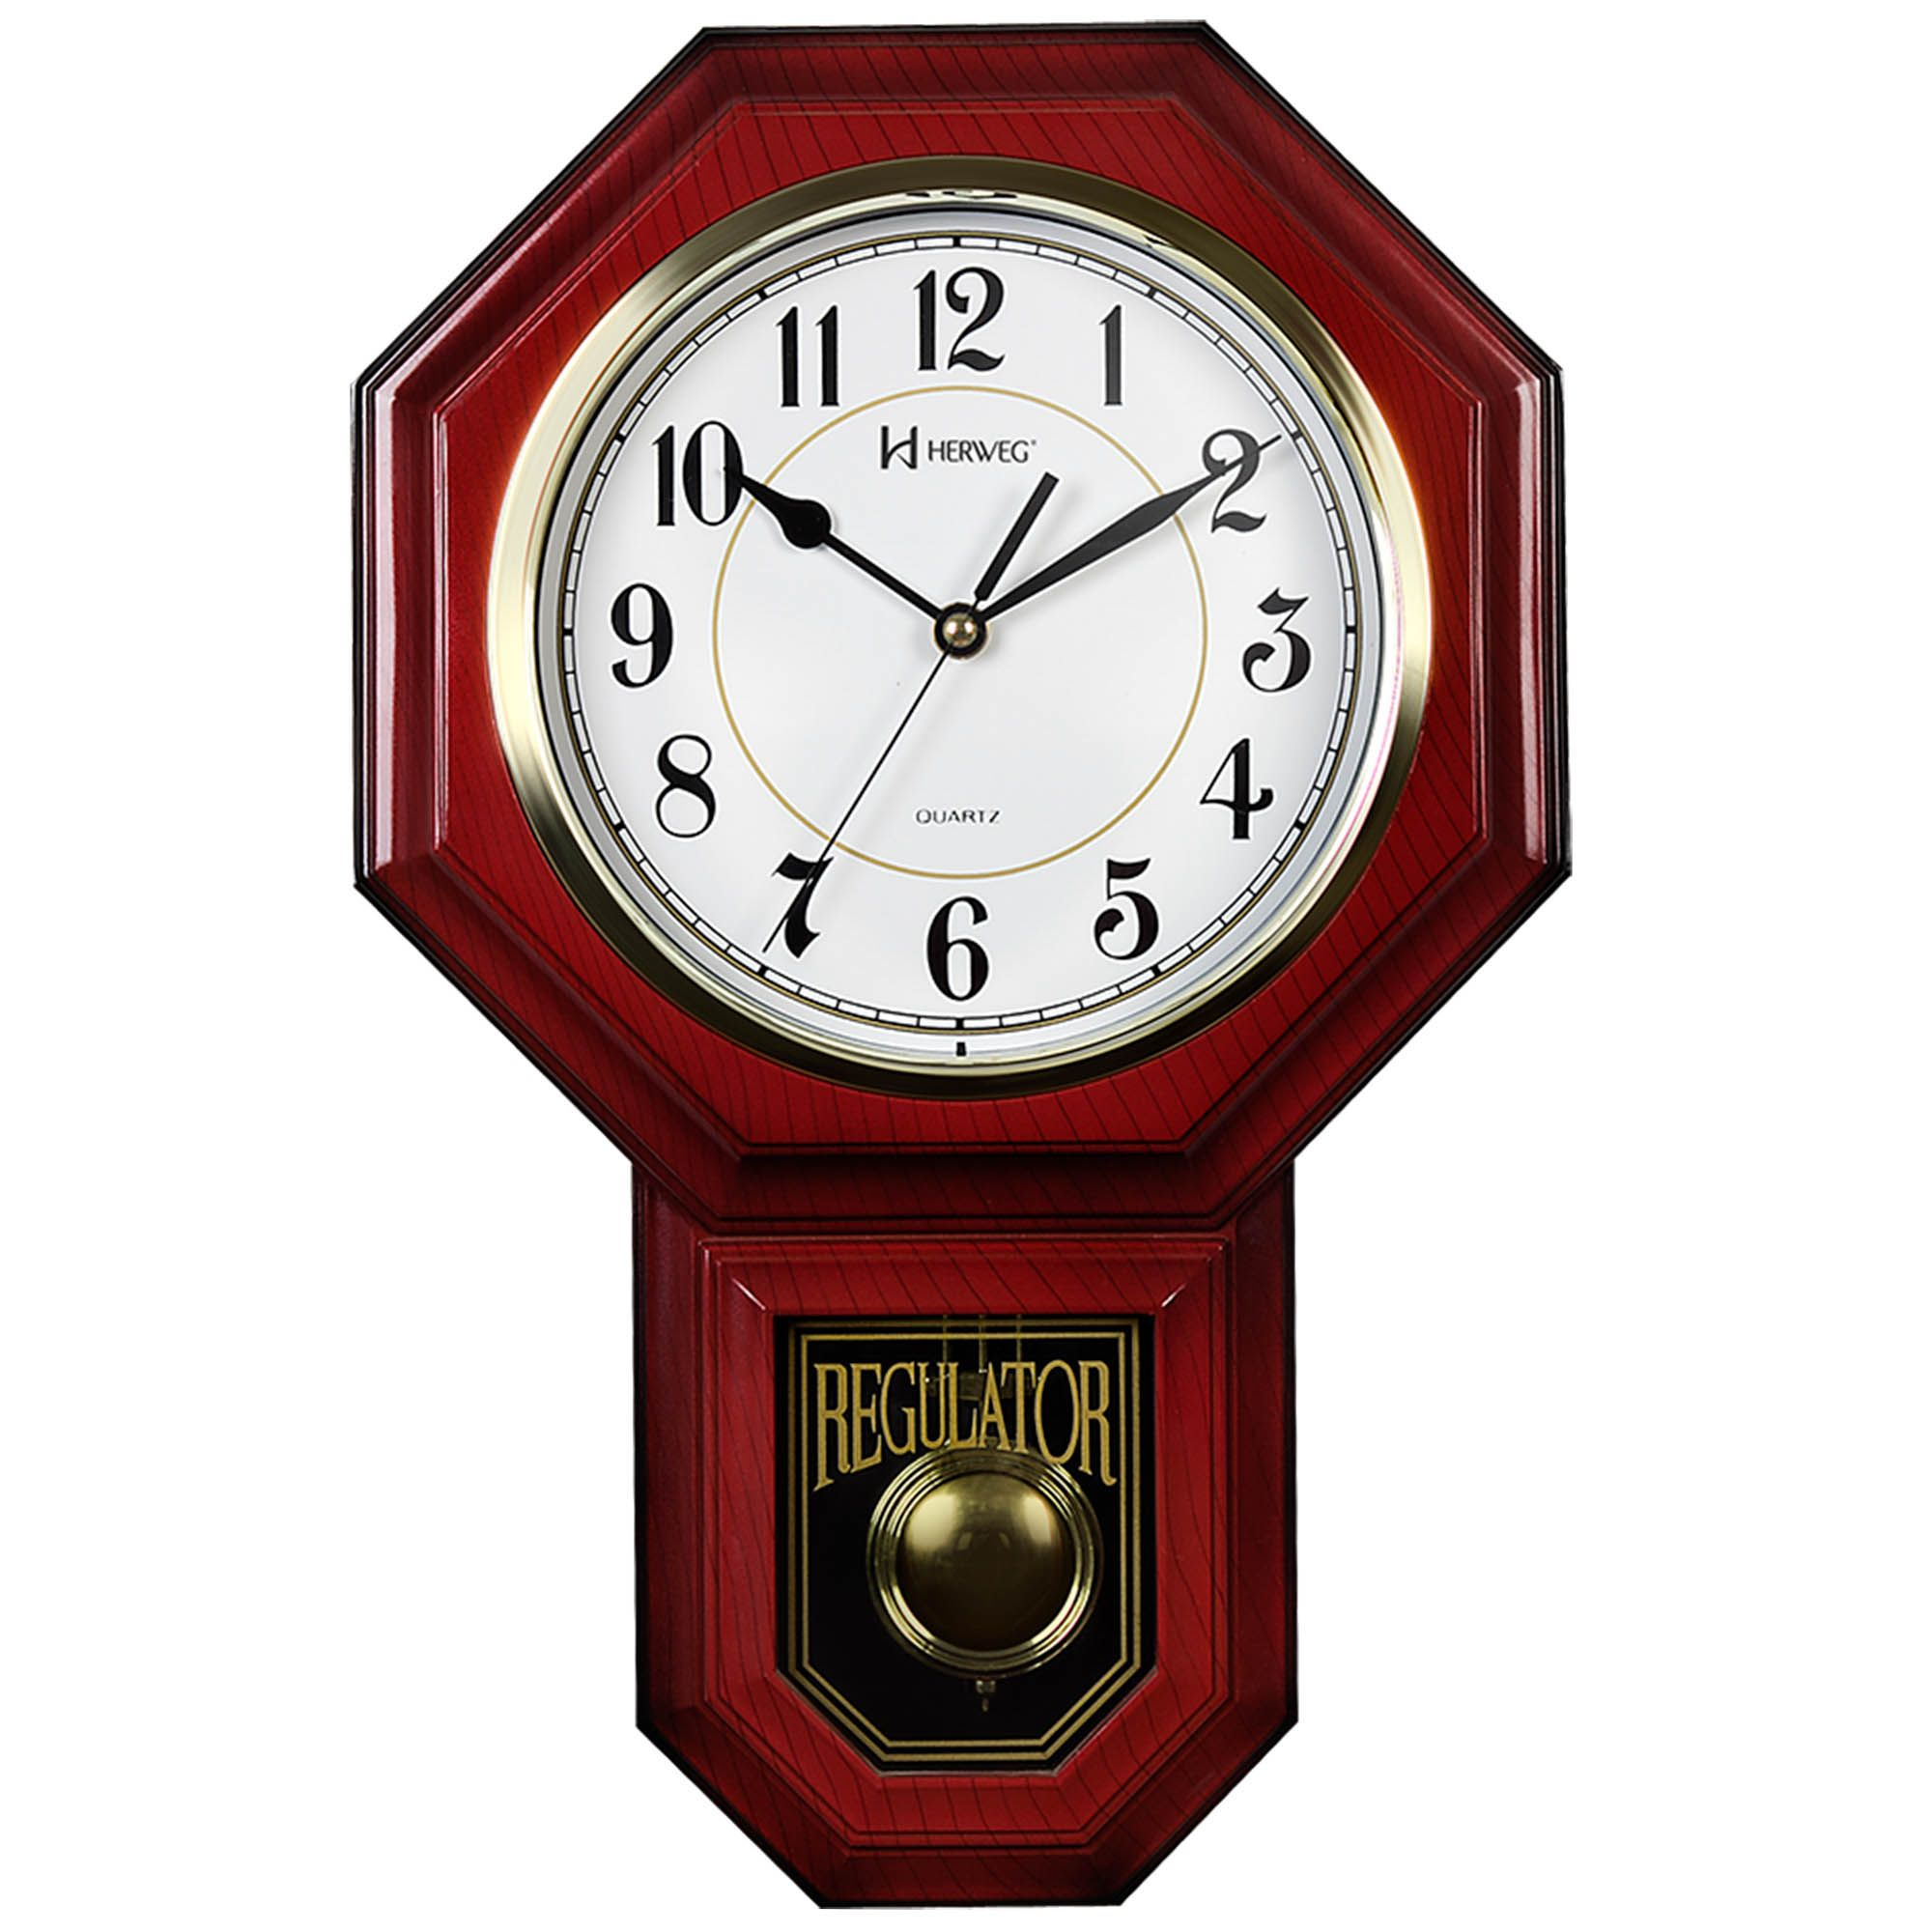 Relógio de Parede Pêndulo Herweg 5304 115 Mogno